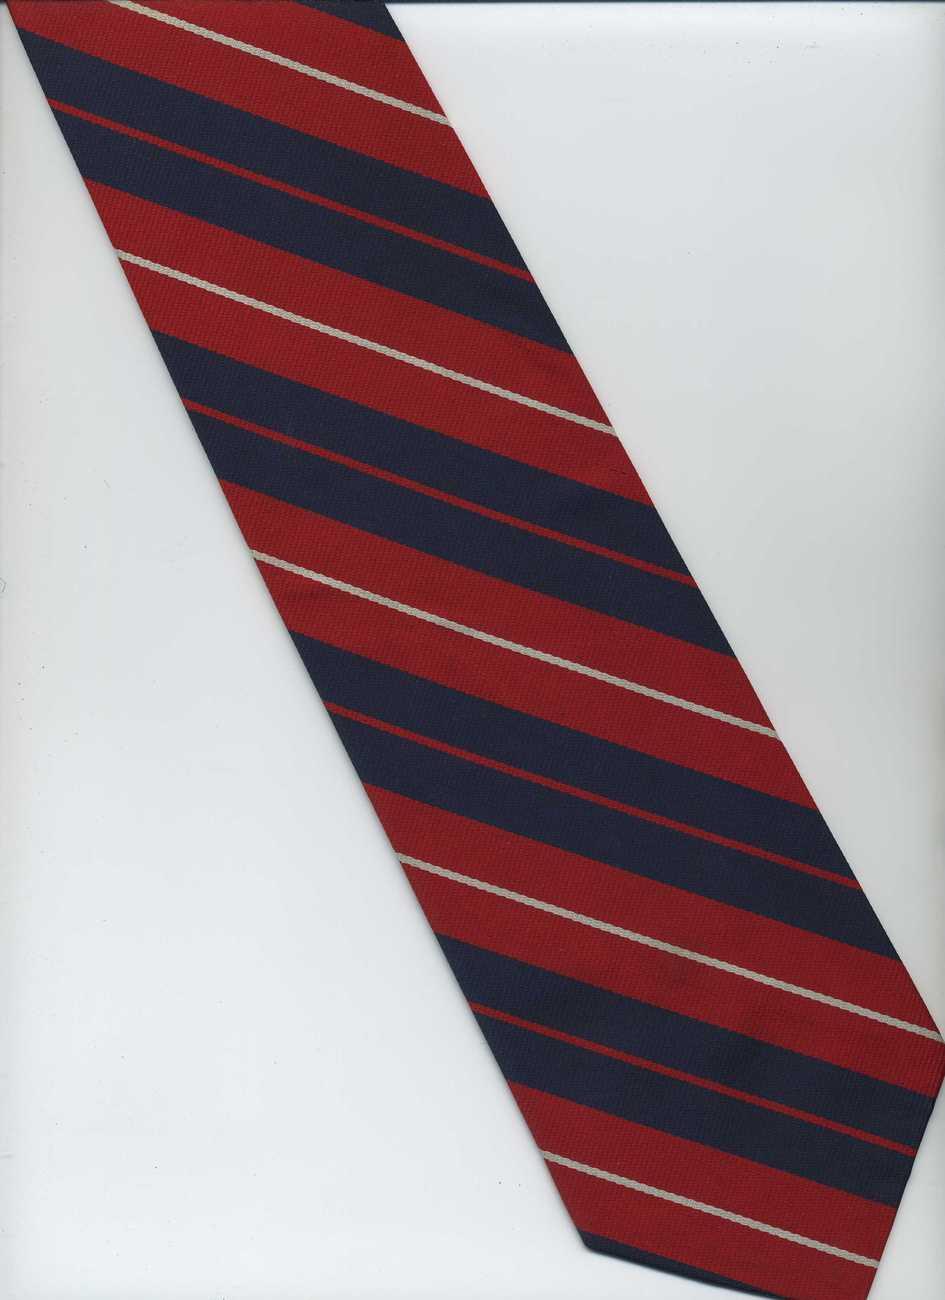 chadwick by wembley tie blue white striped tie